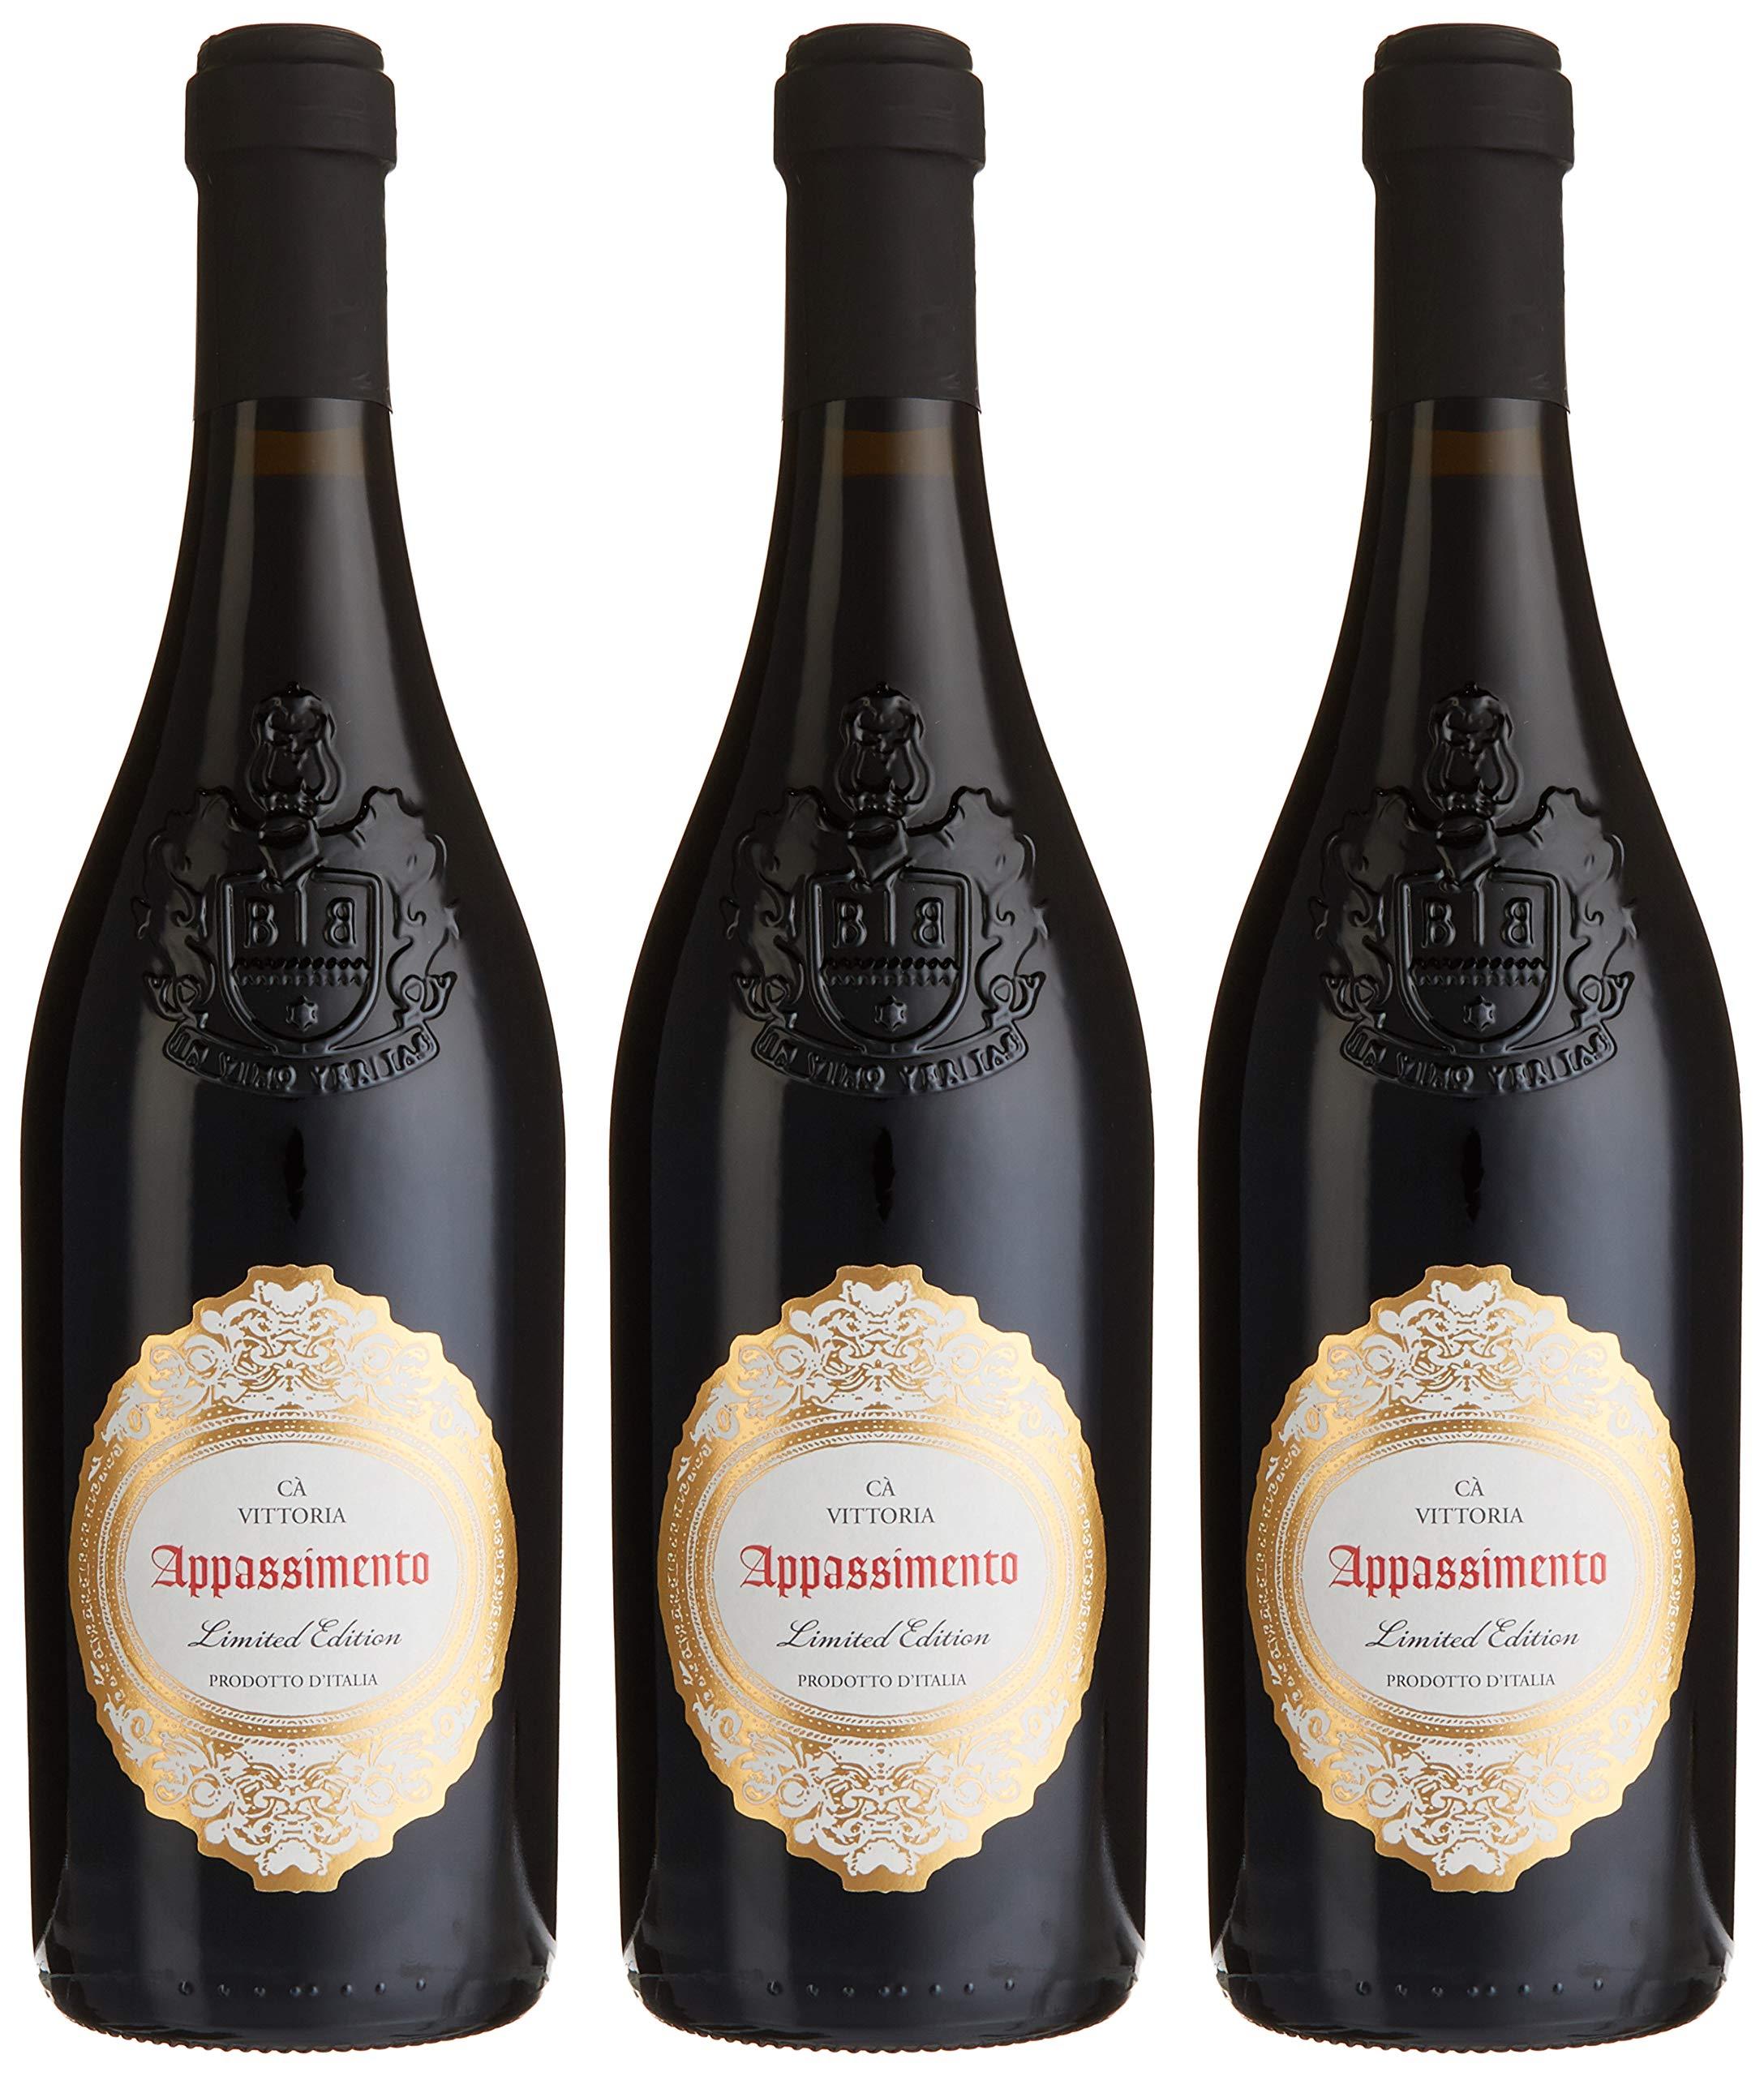 C-Vittoria-Appassimento-Gold-Negroamaro-20152016-Trocken-3-x-075-l